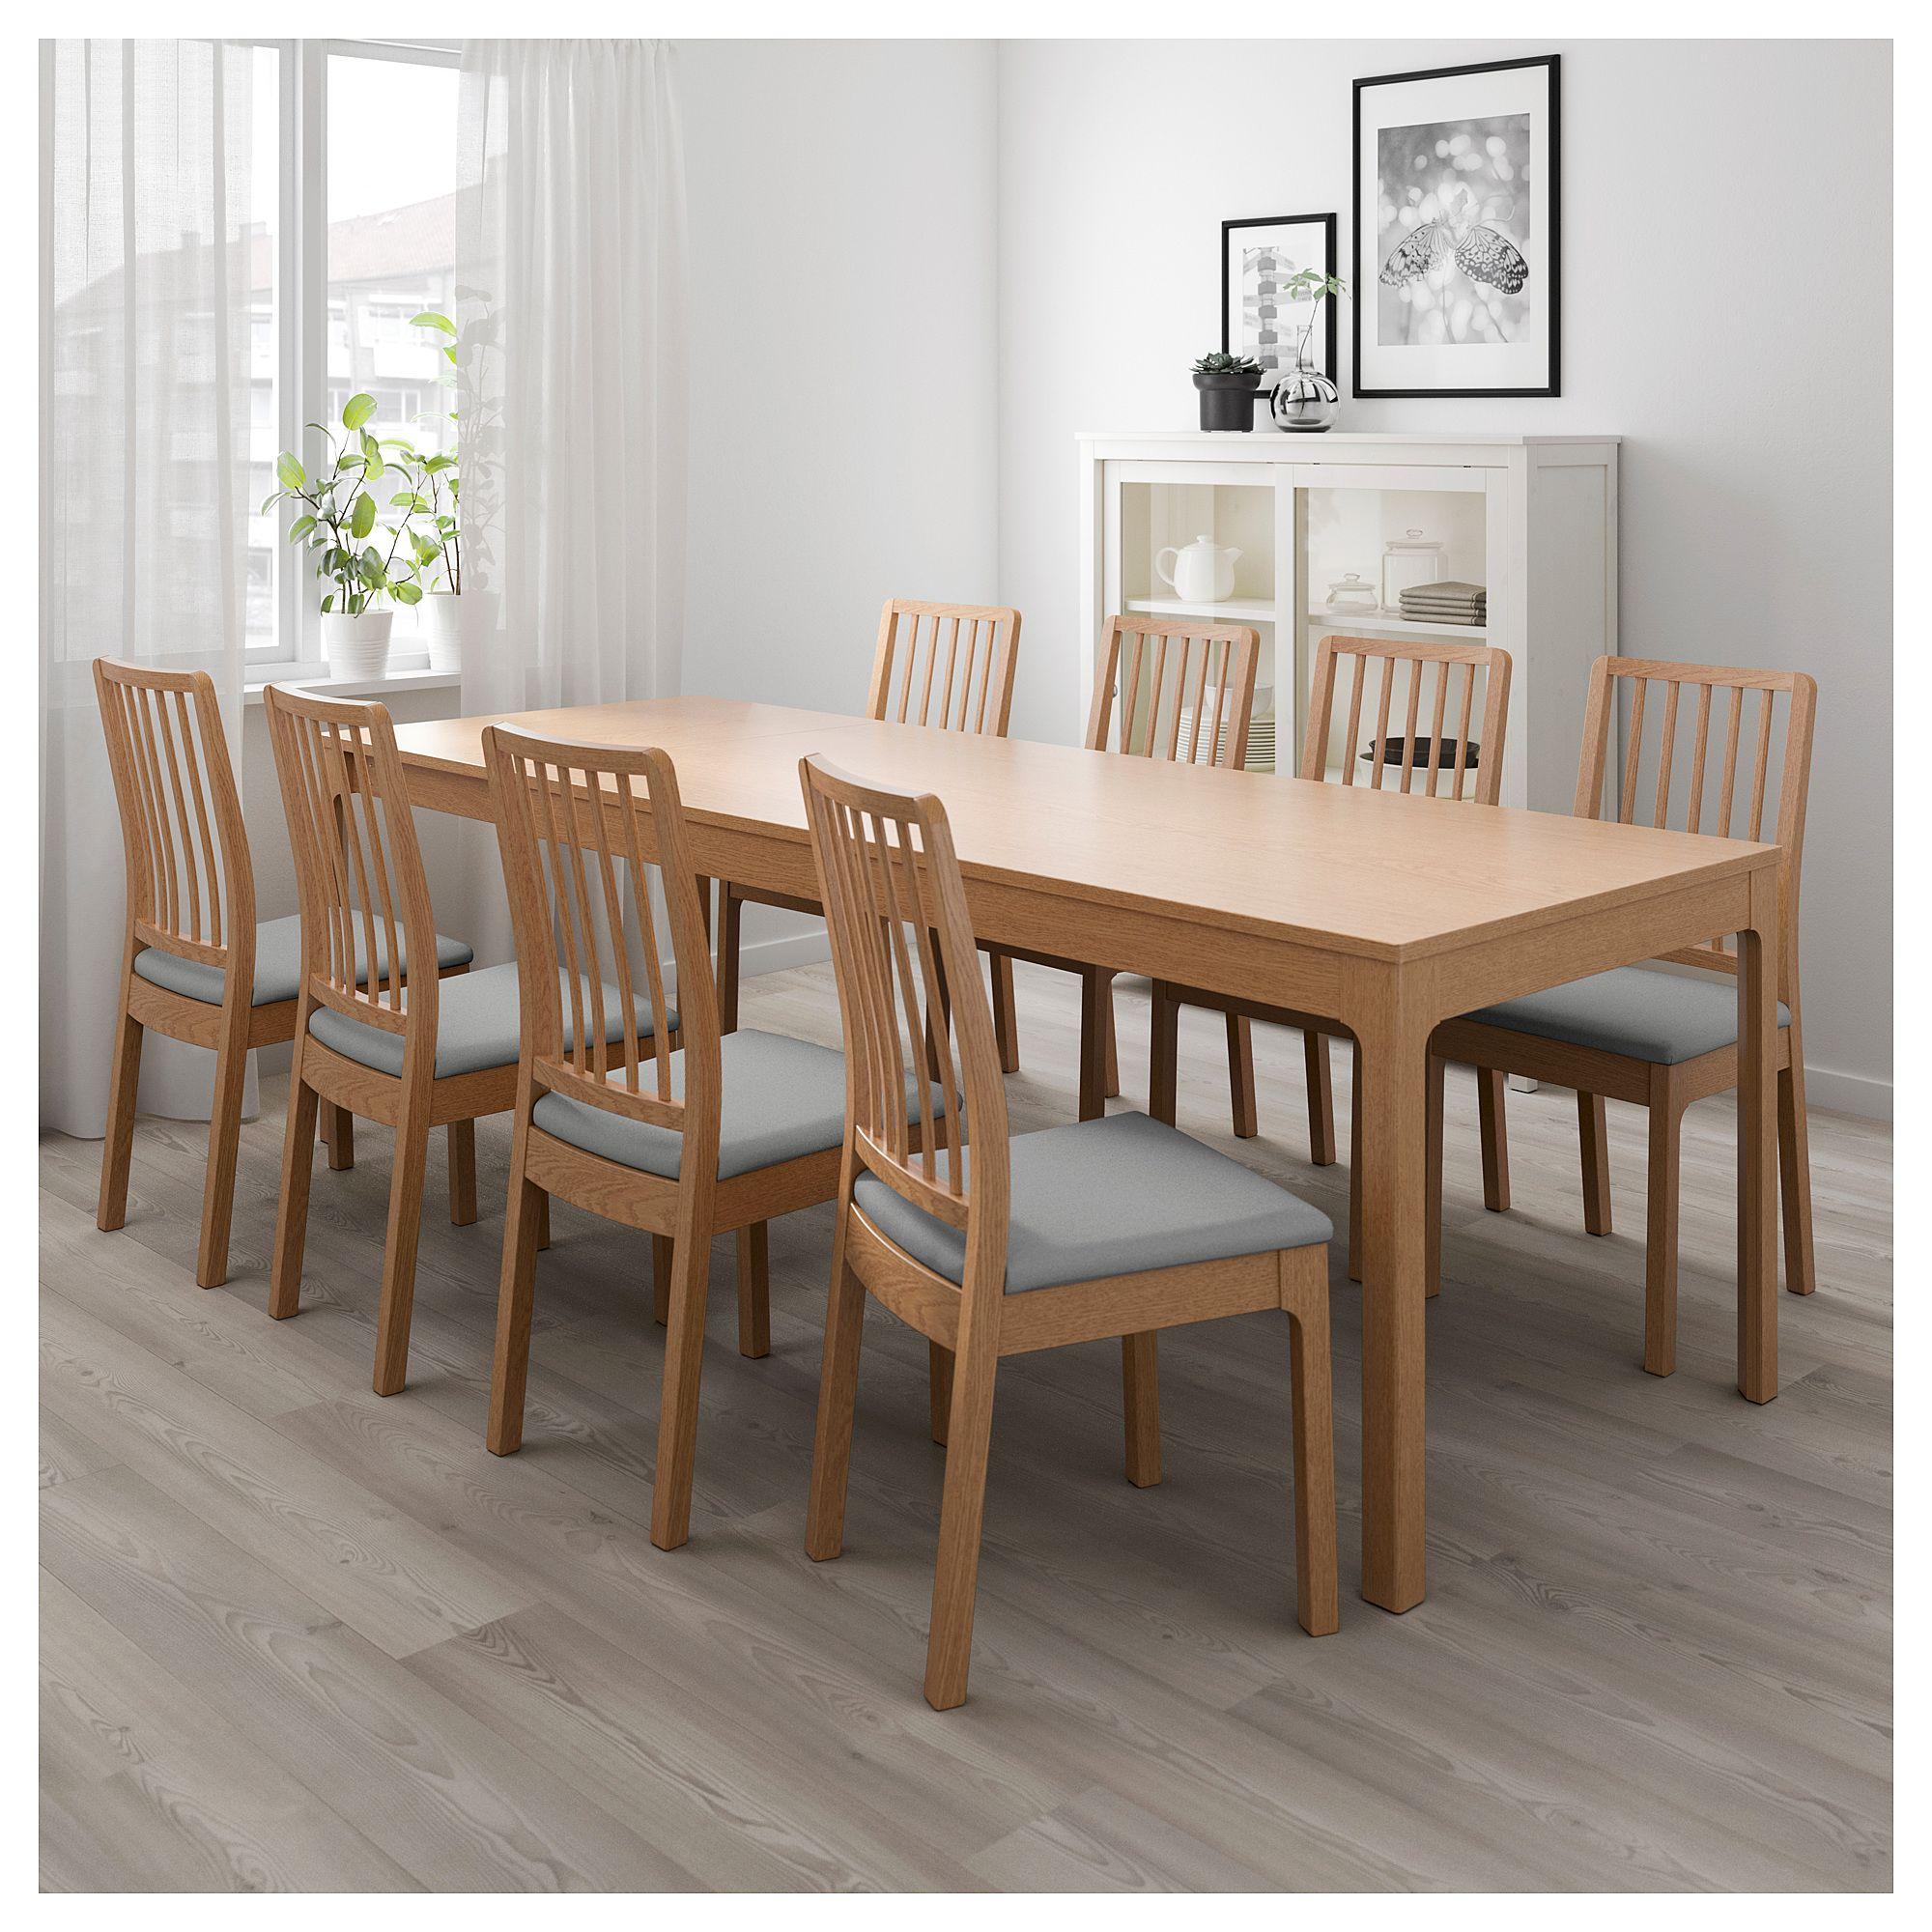 Ekedalen Extendable Table Ikea Ikea Dining Room Table Ikea Table